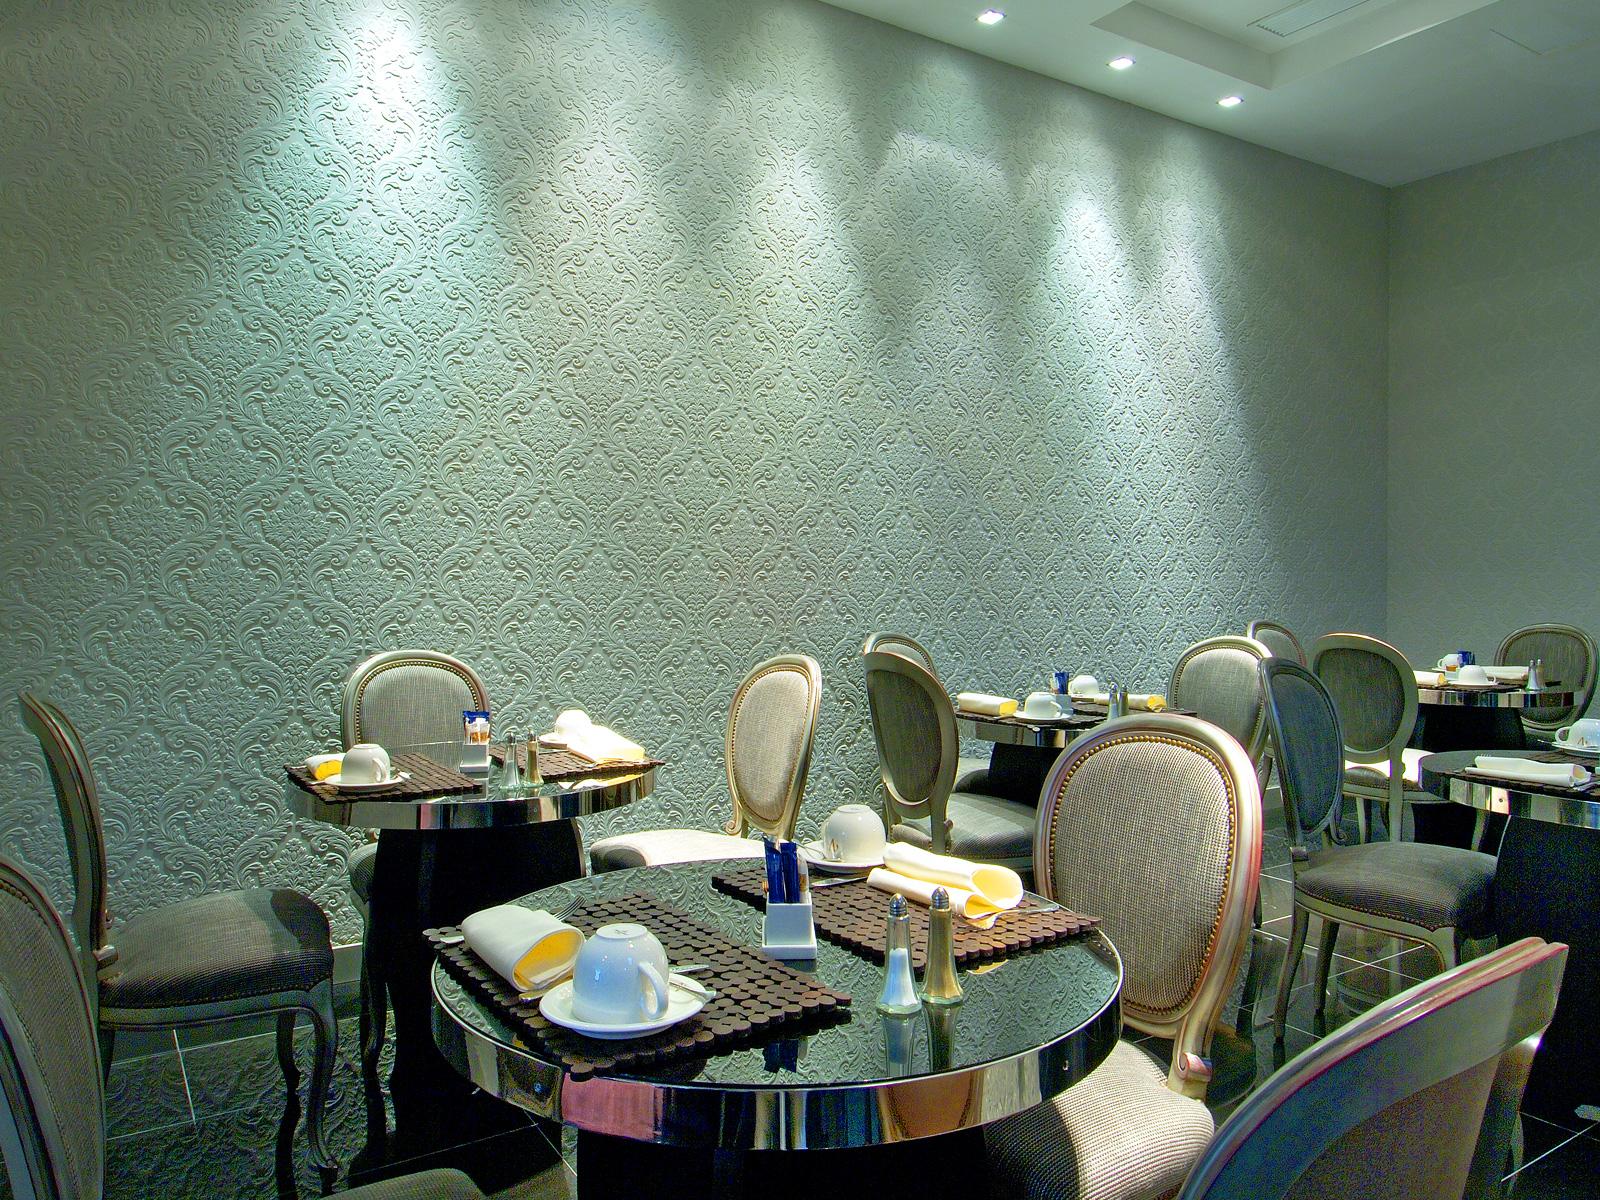 Buffet Breakfast - Vincci Palace 4*